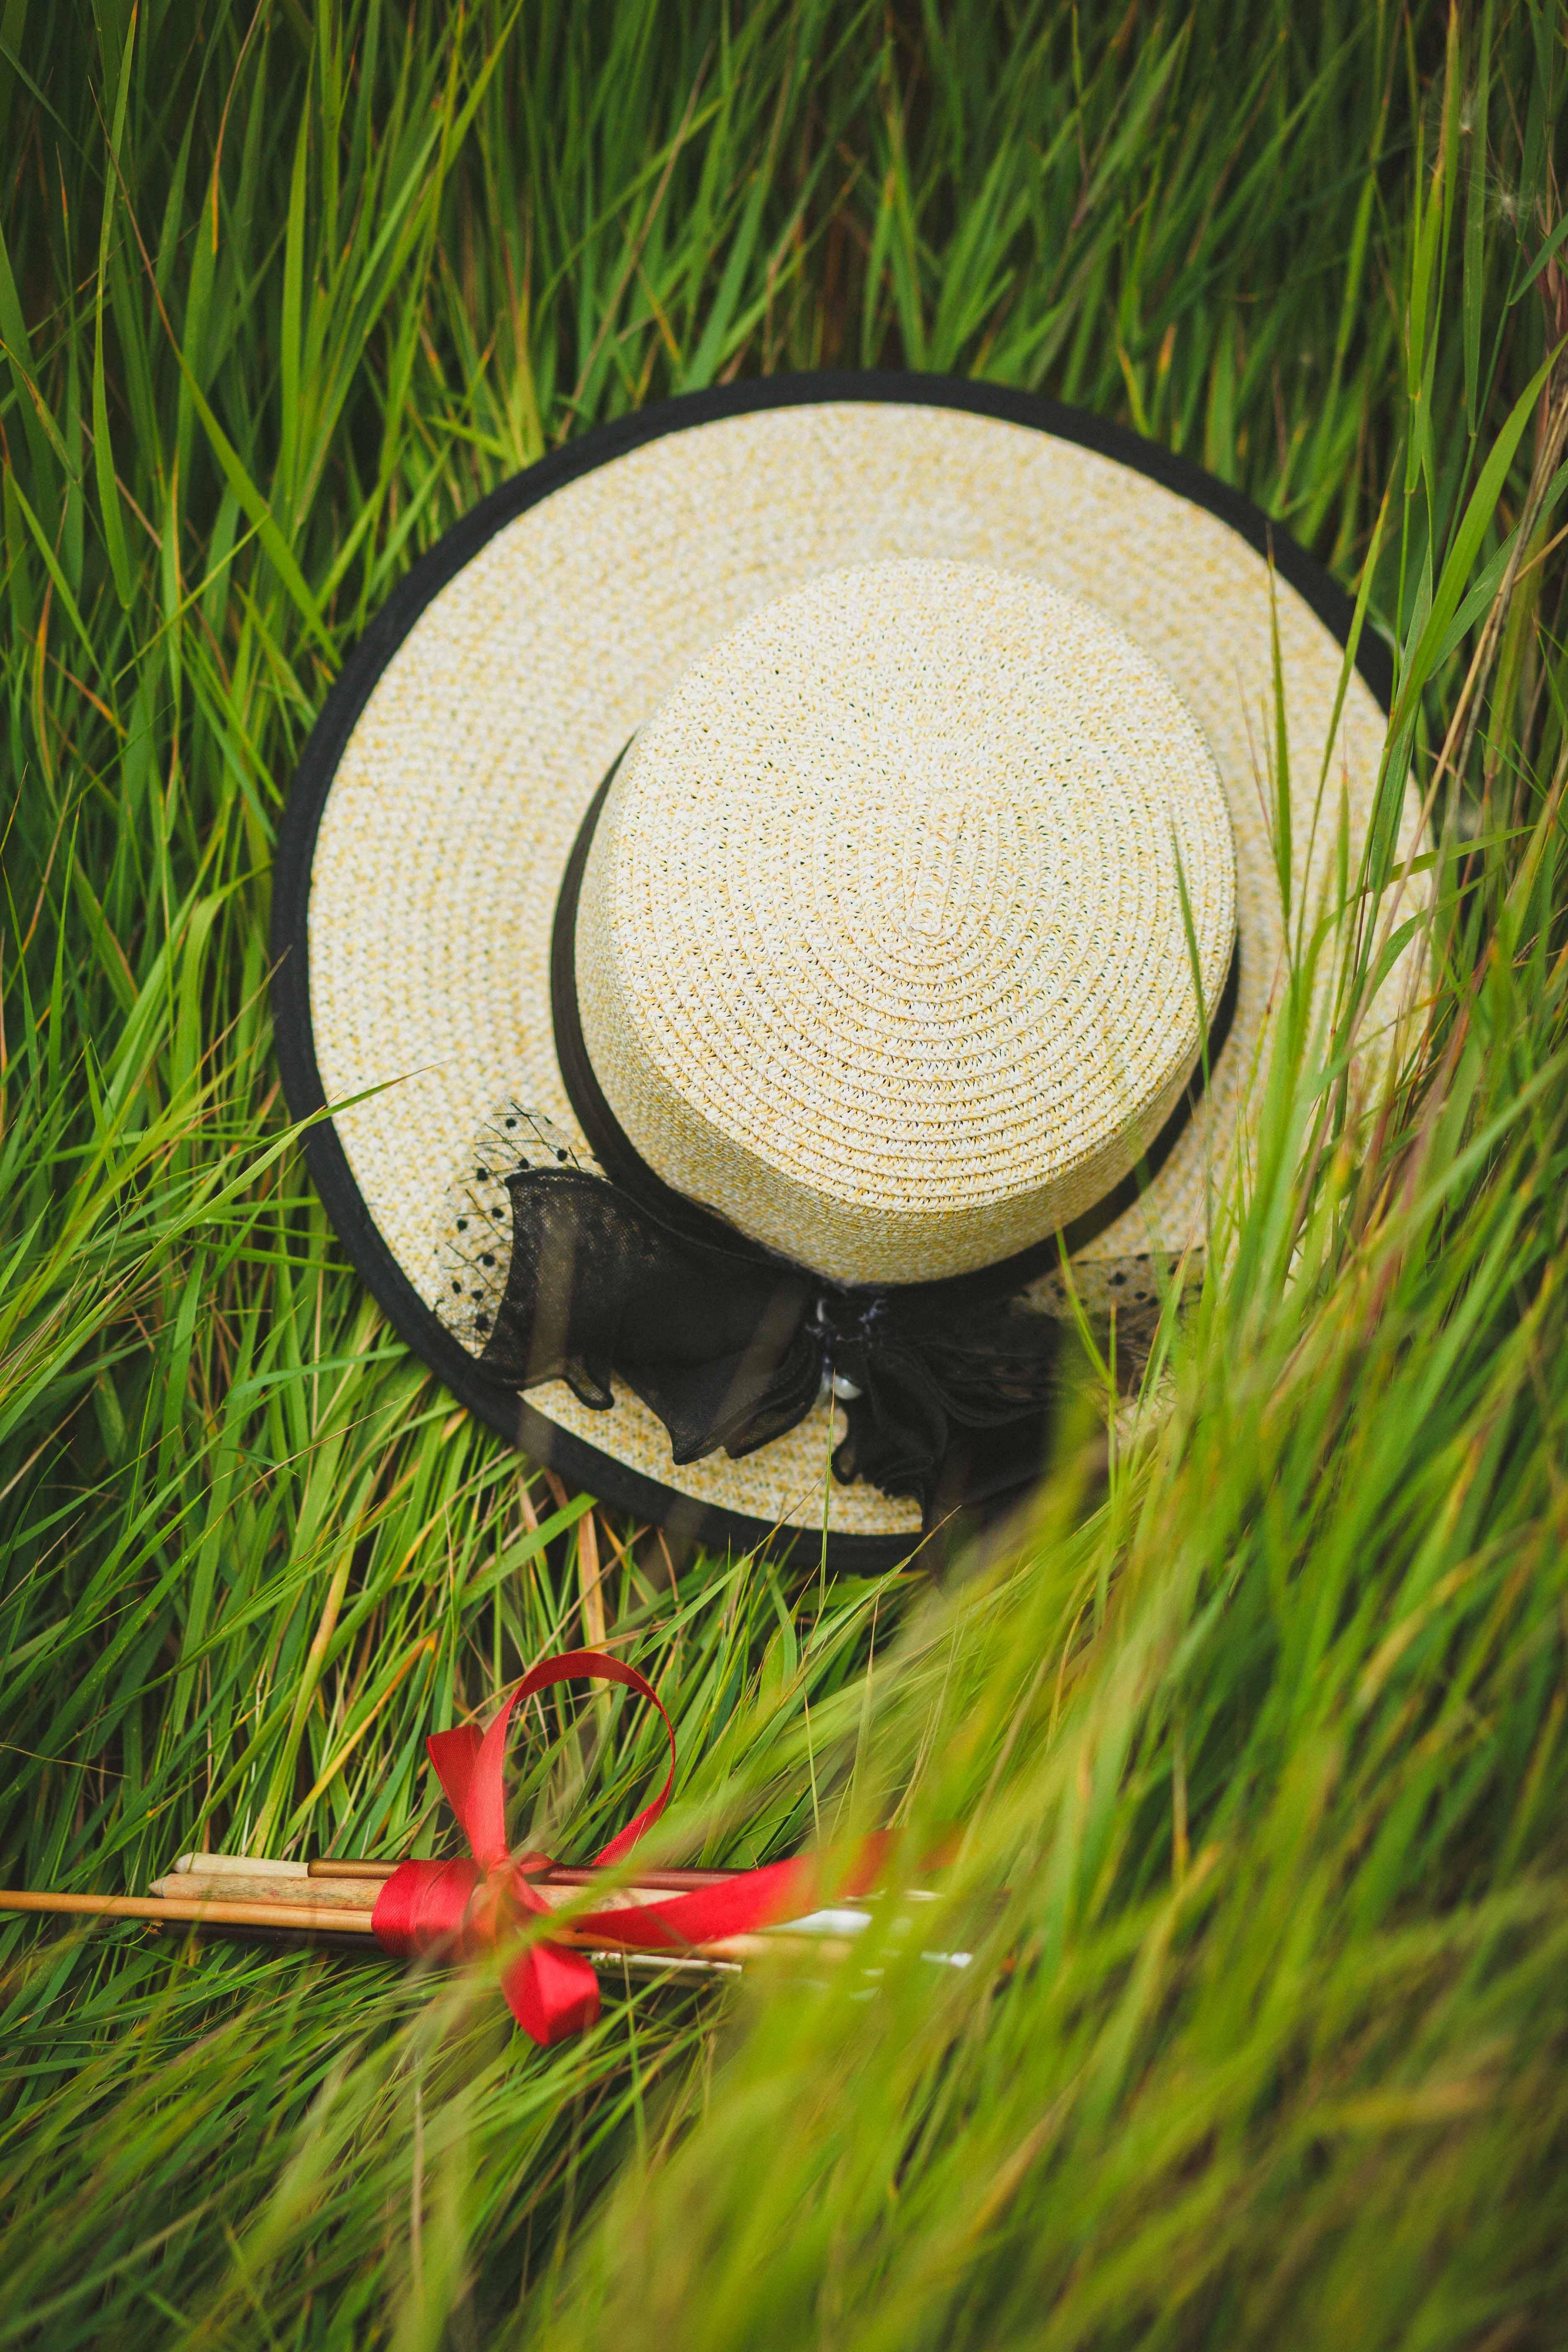 Beige and Black Wicker Hat